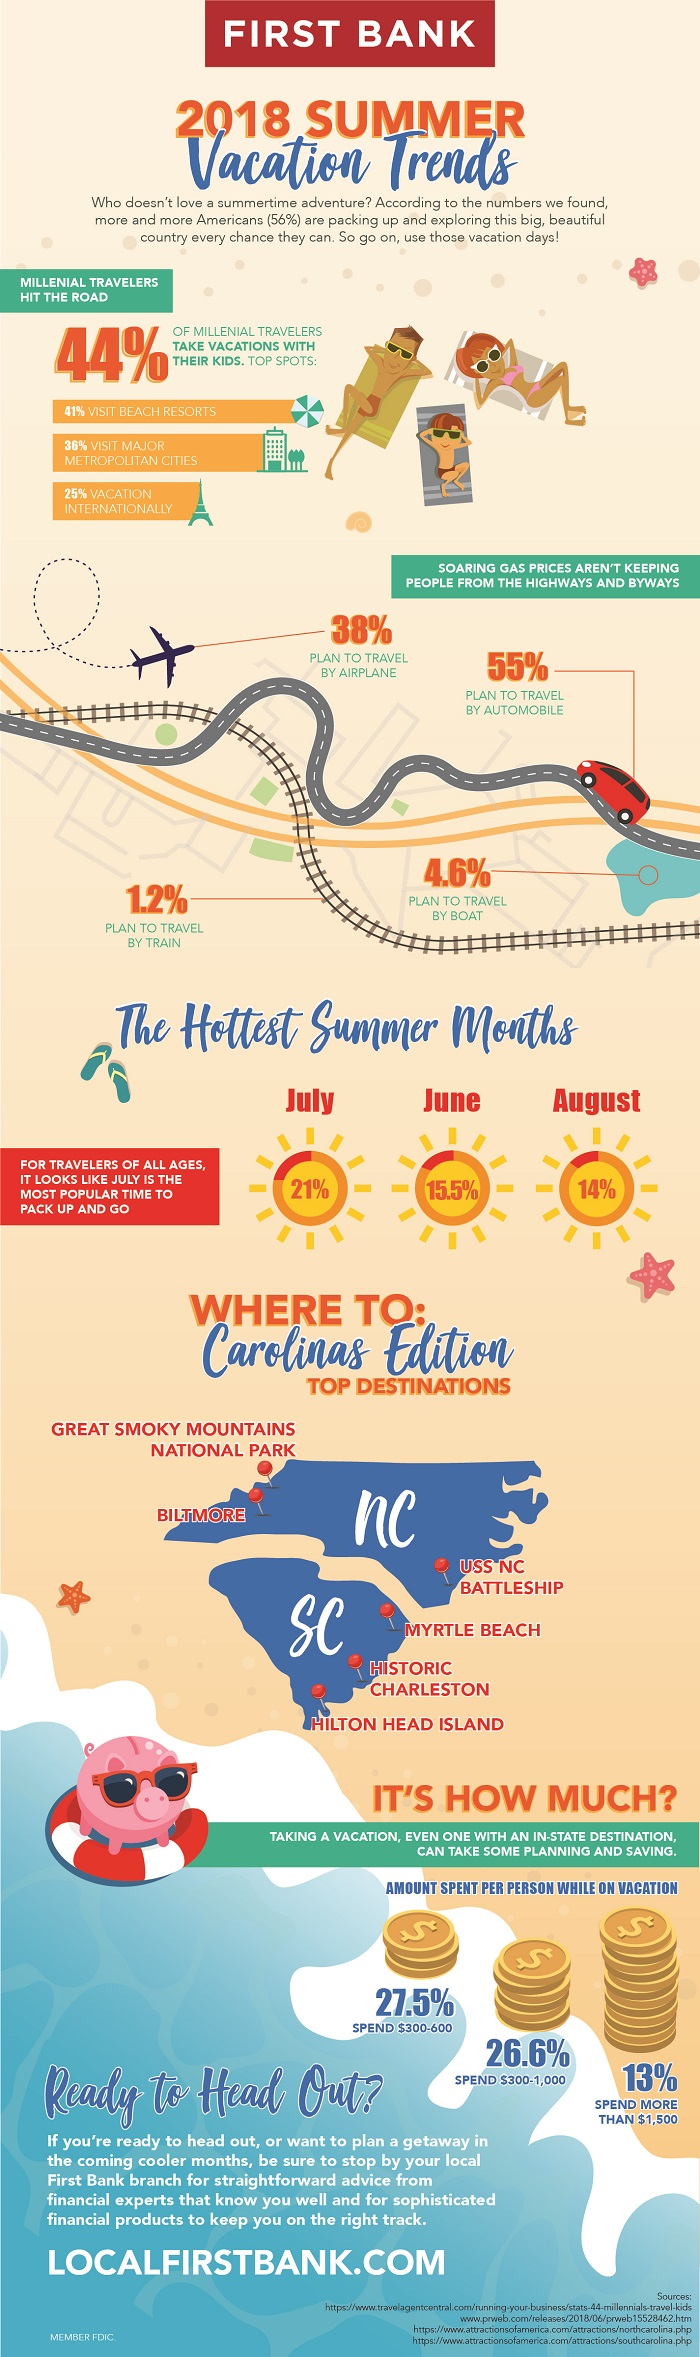 Summer vacation travel trends